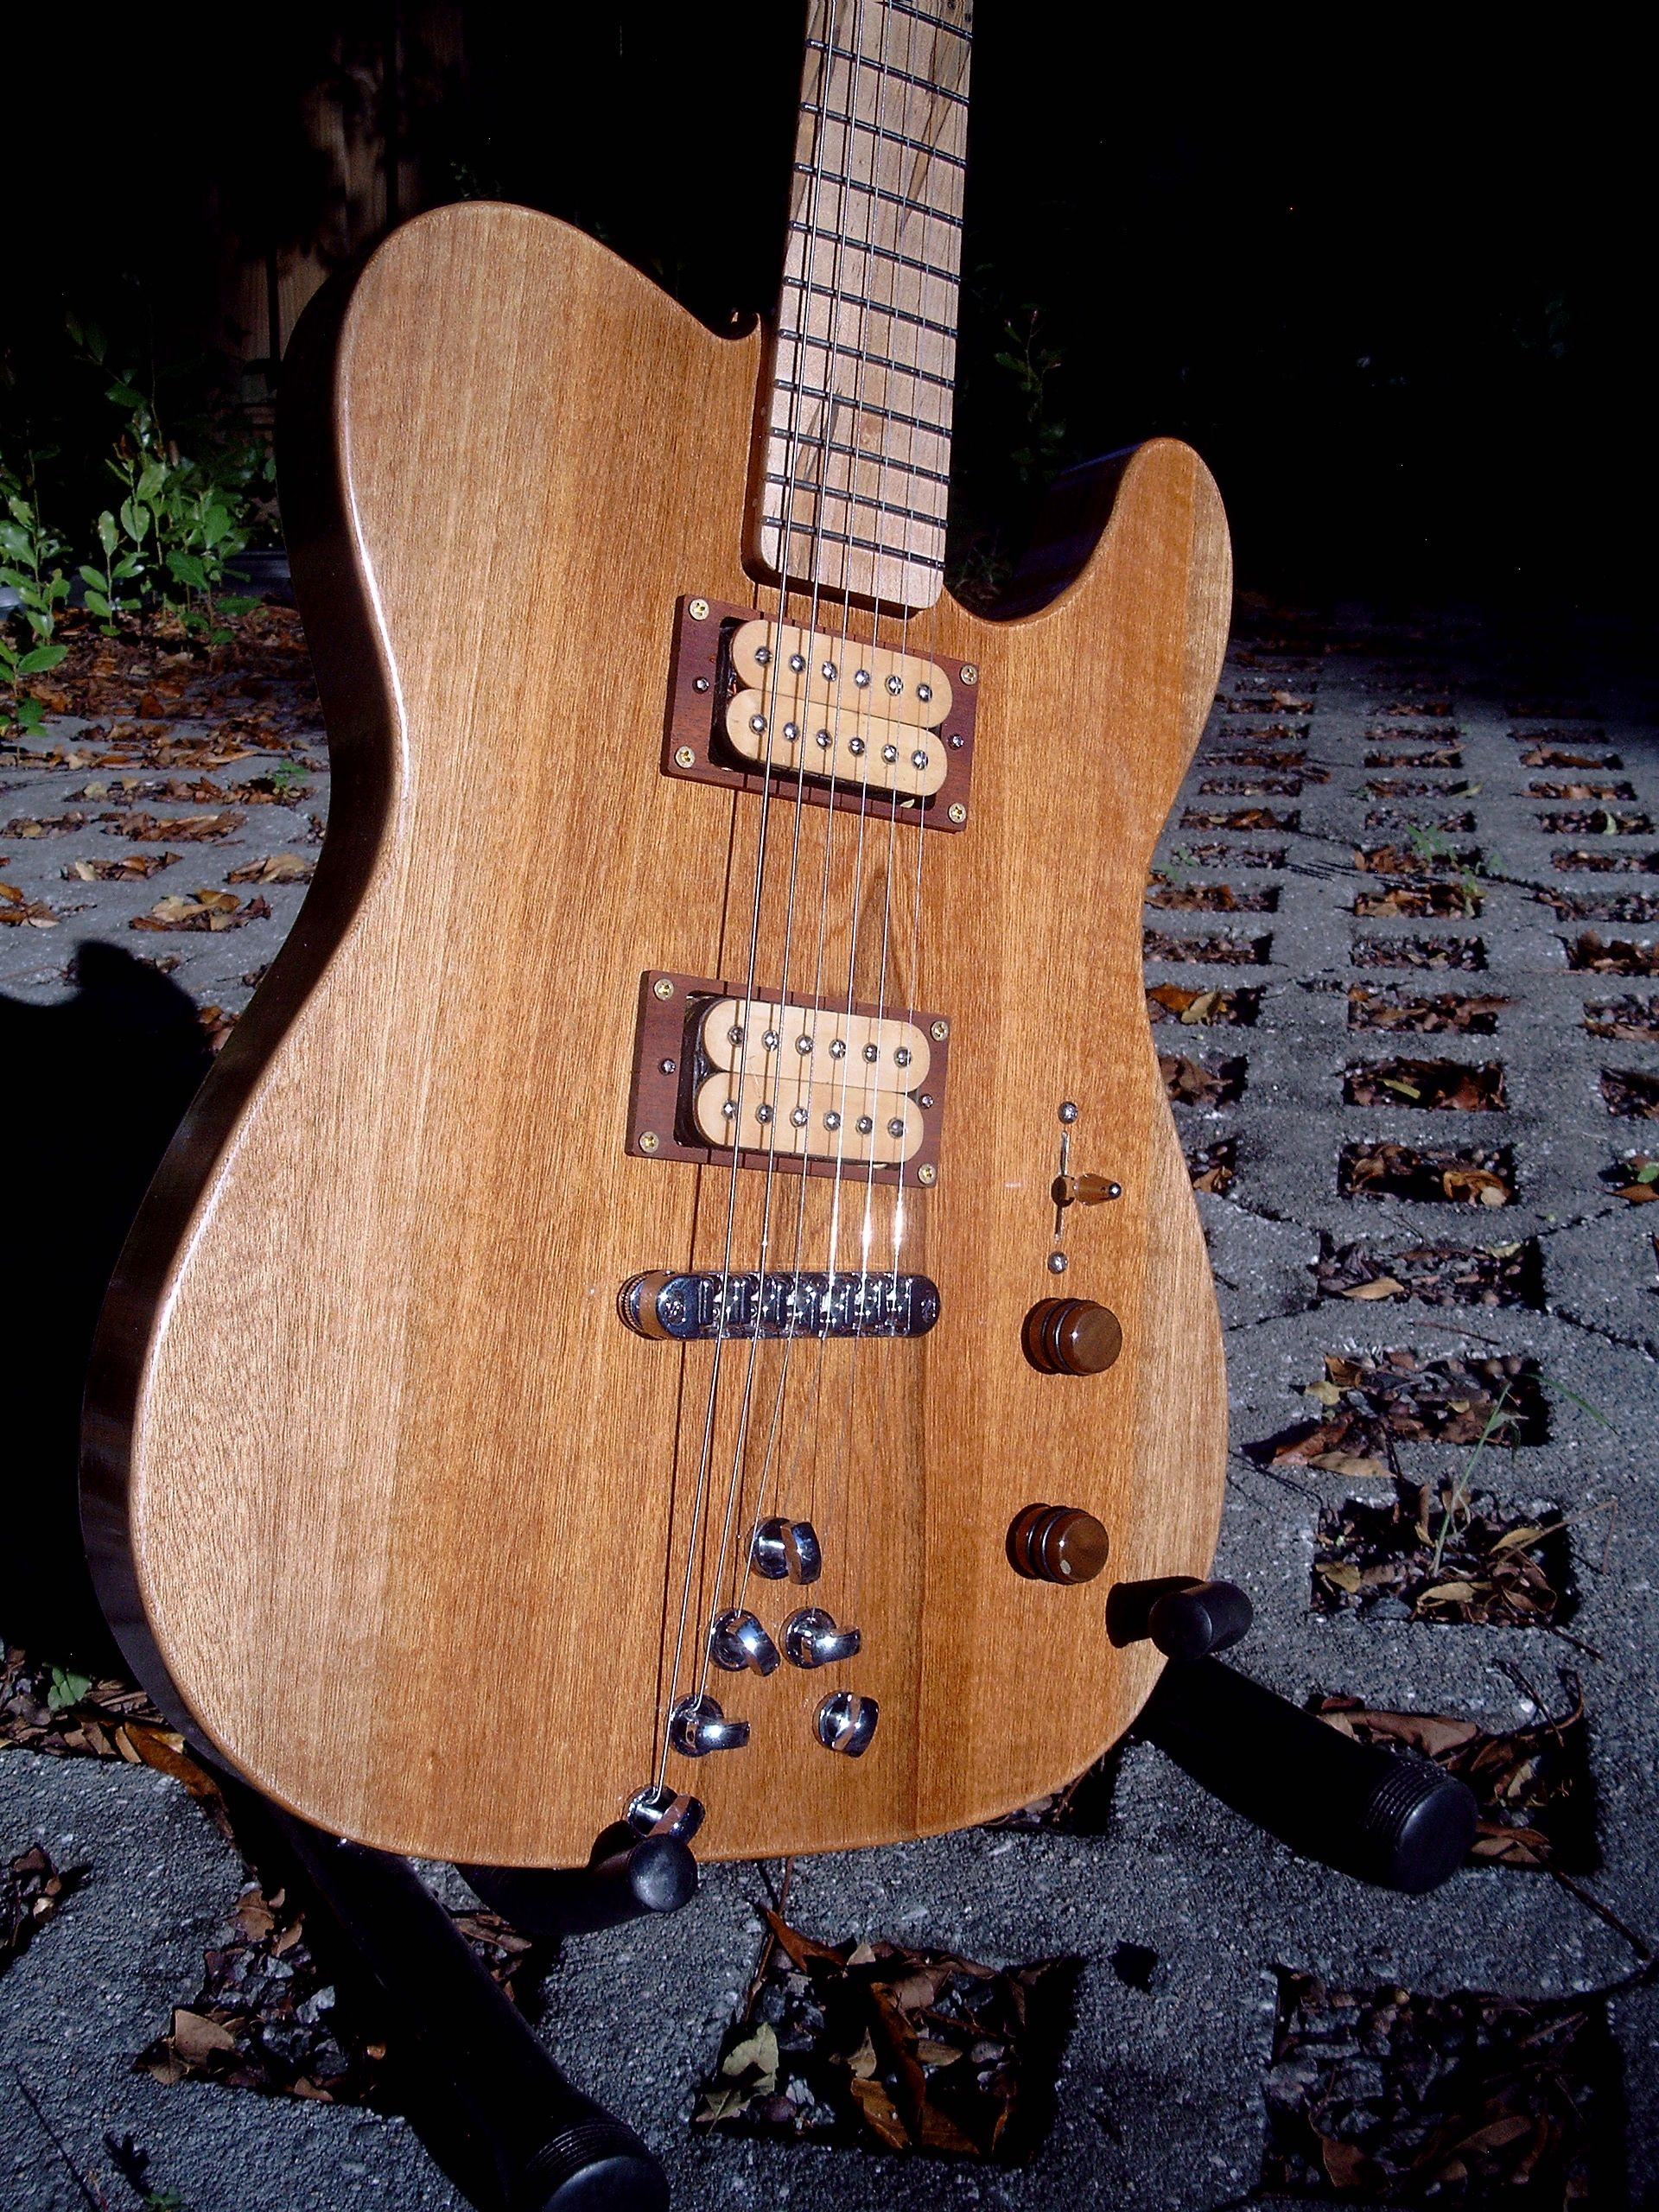 11 Top Drive Build images | Guitar building, Instruments